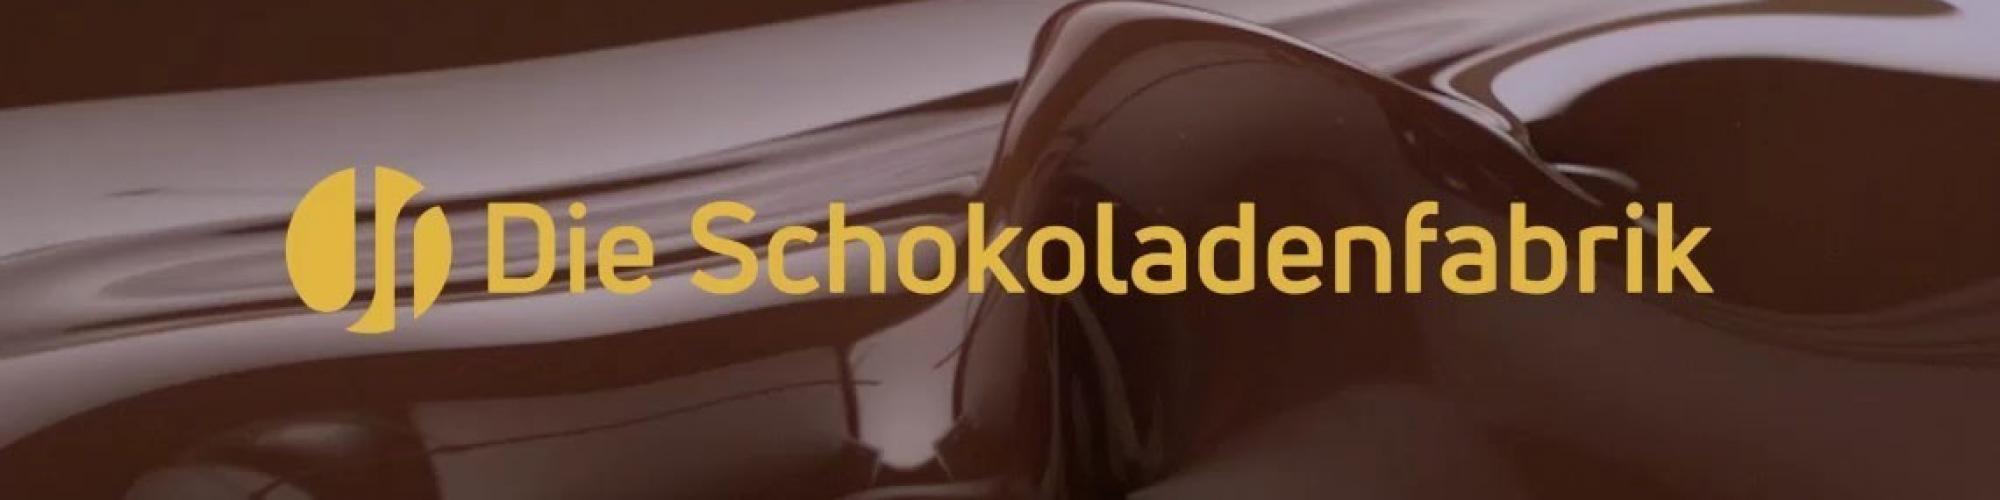 JR Die Schokoladenfabrik GmbH